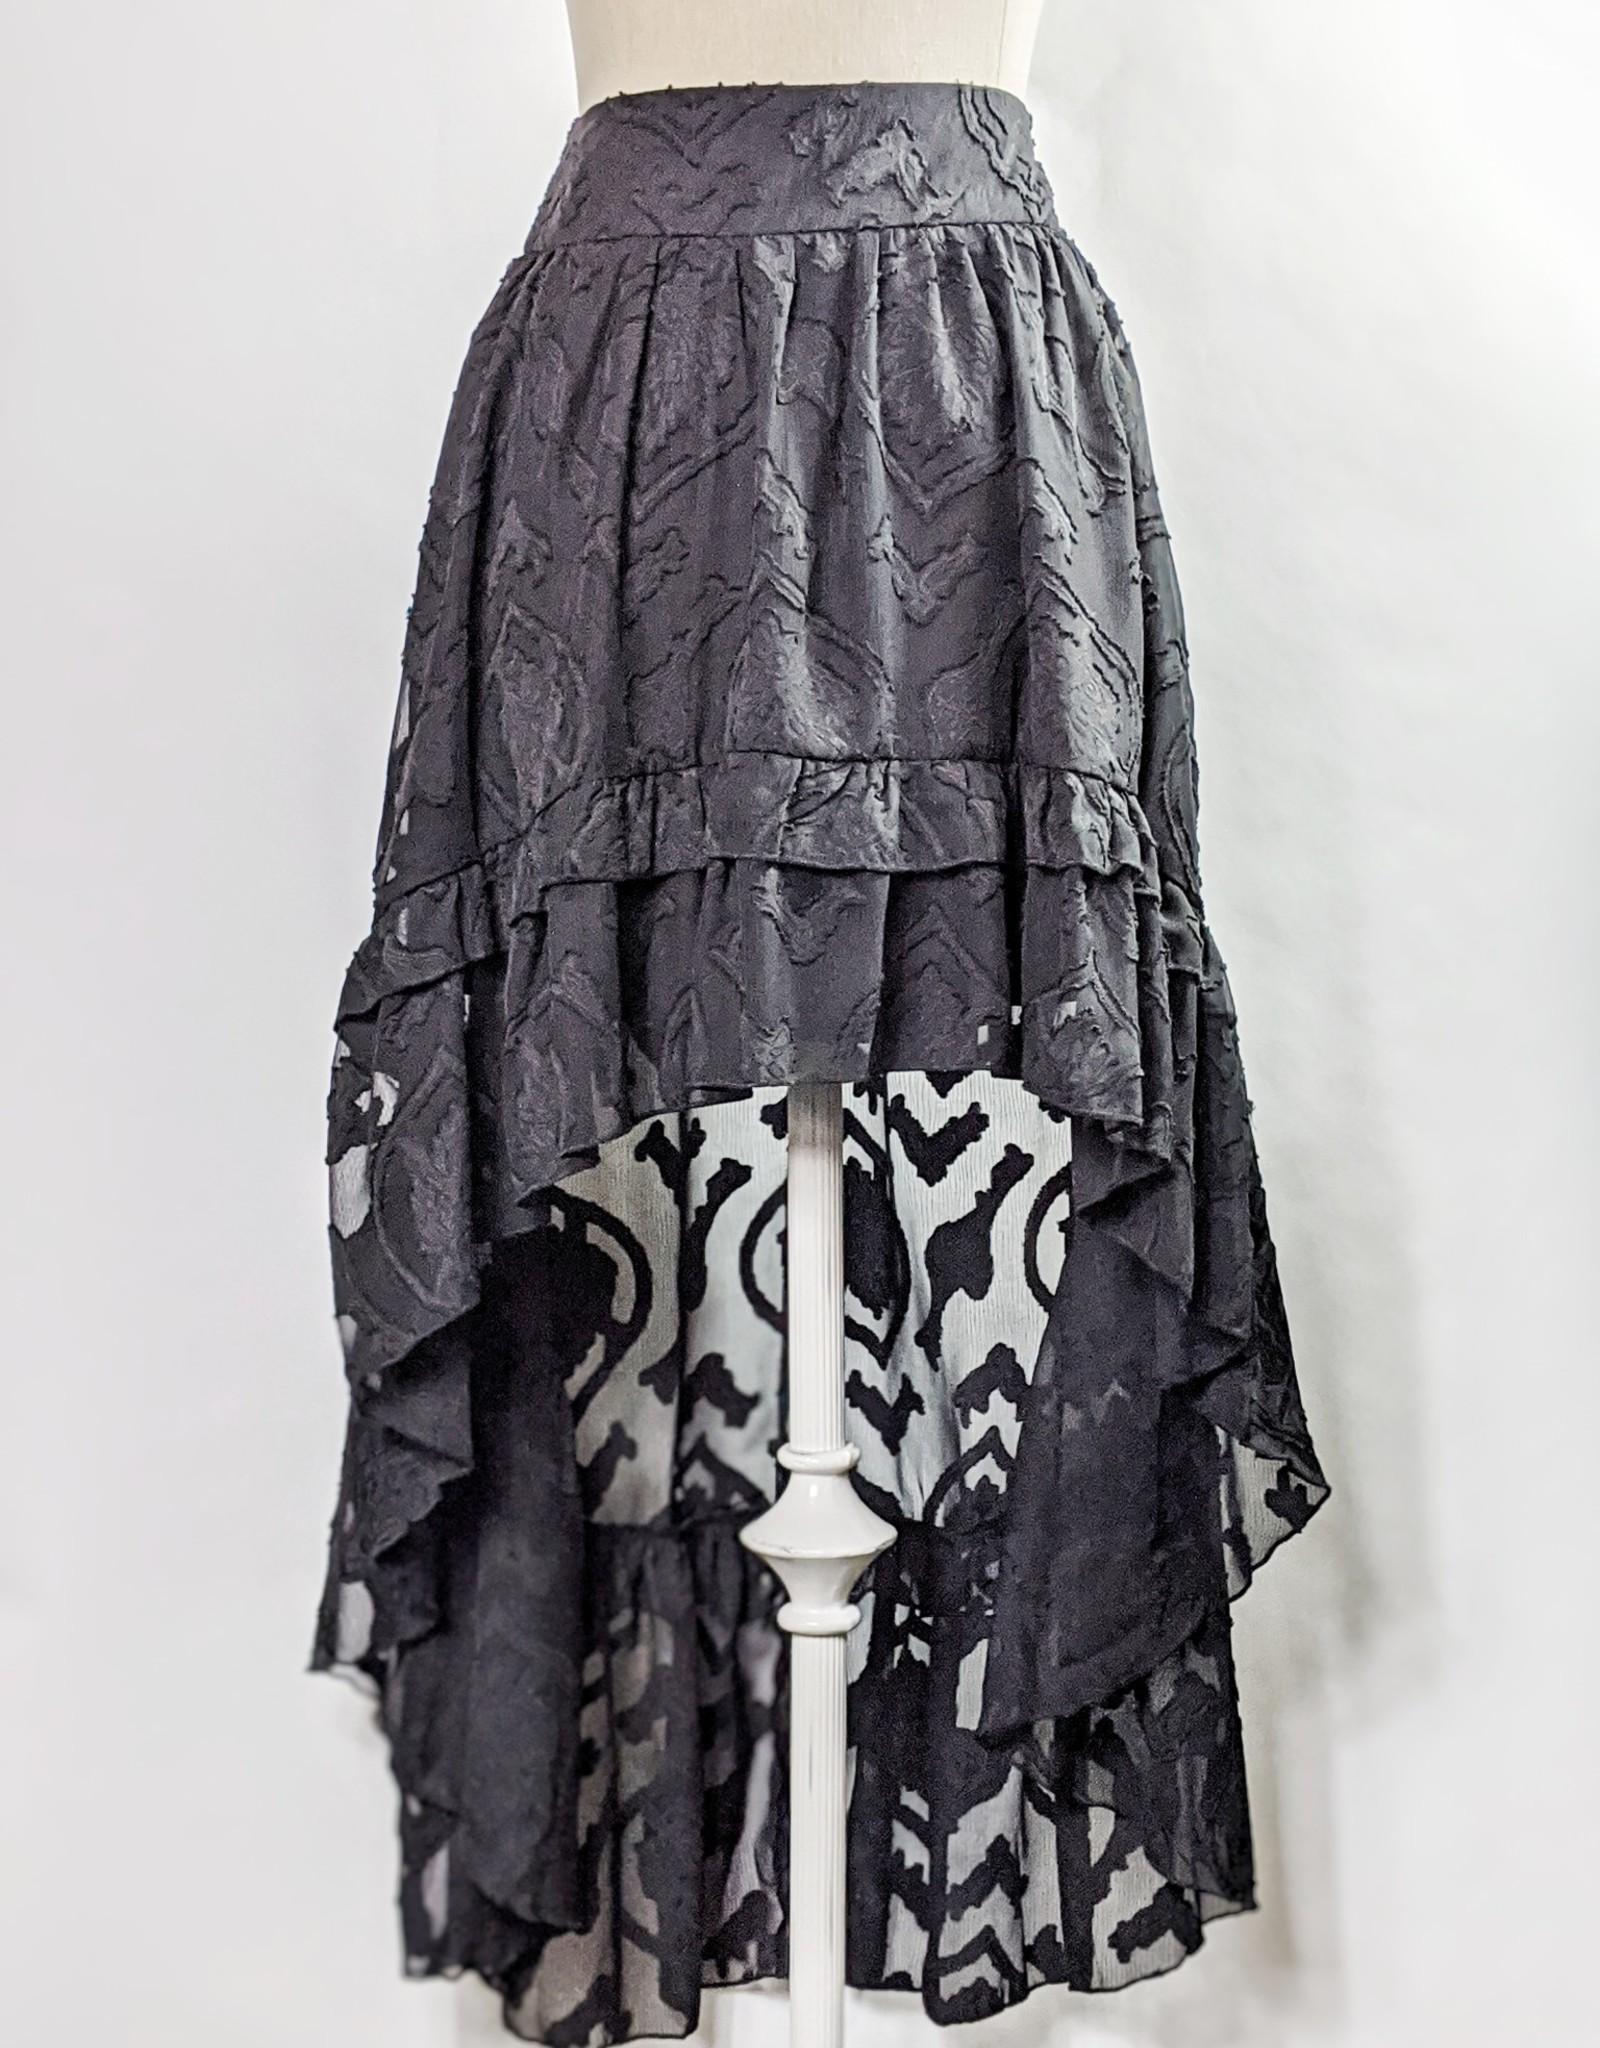 Fanco Sheer Combo High Low Skirt